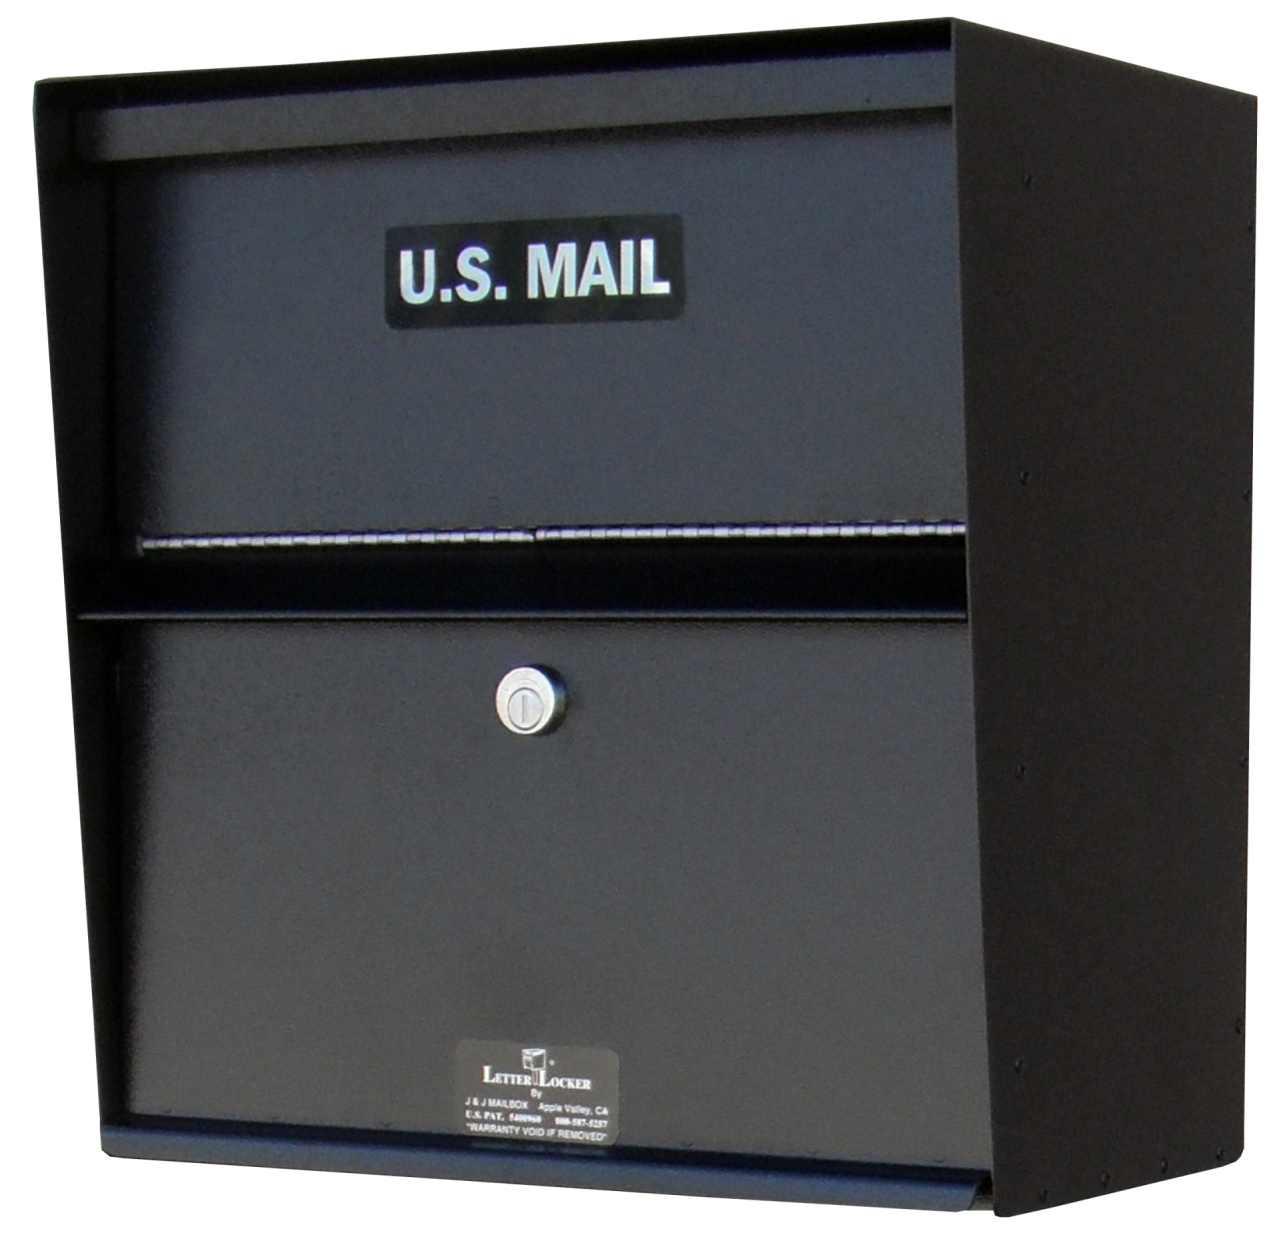 Wall Mailbox With Lock Locking Wall Mounted Mailbox